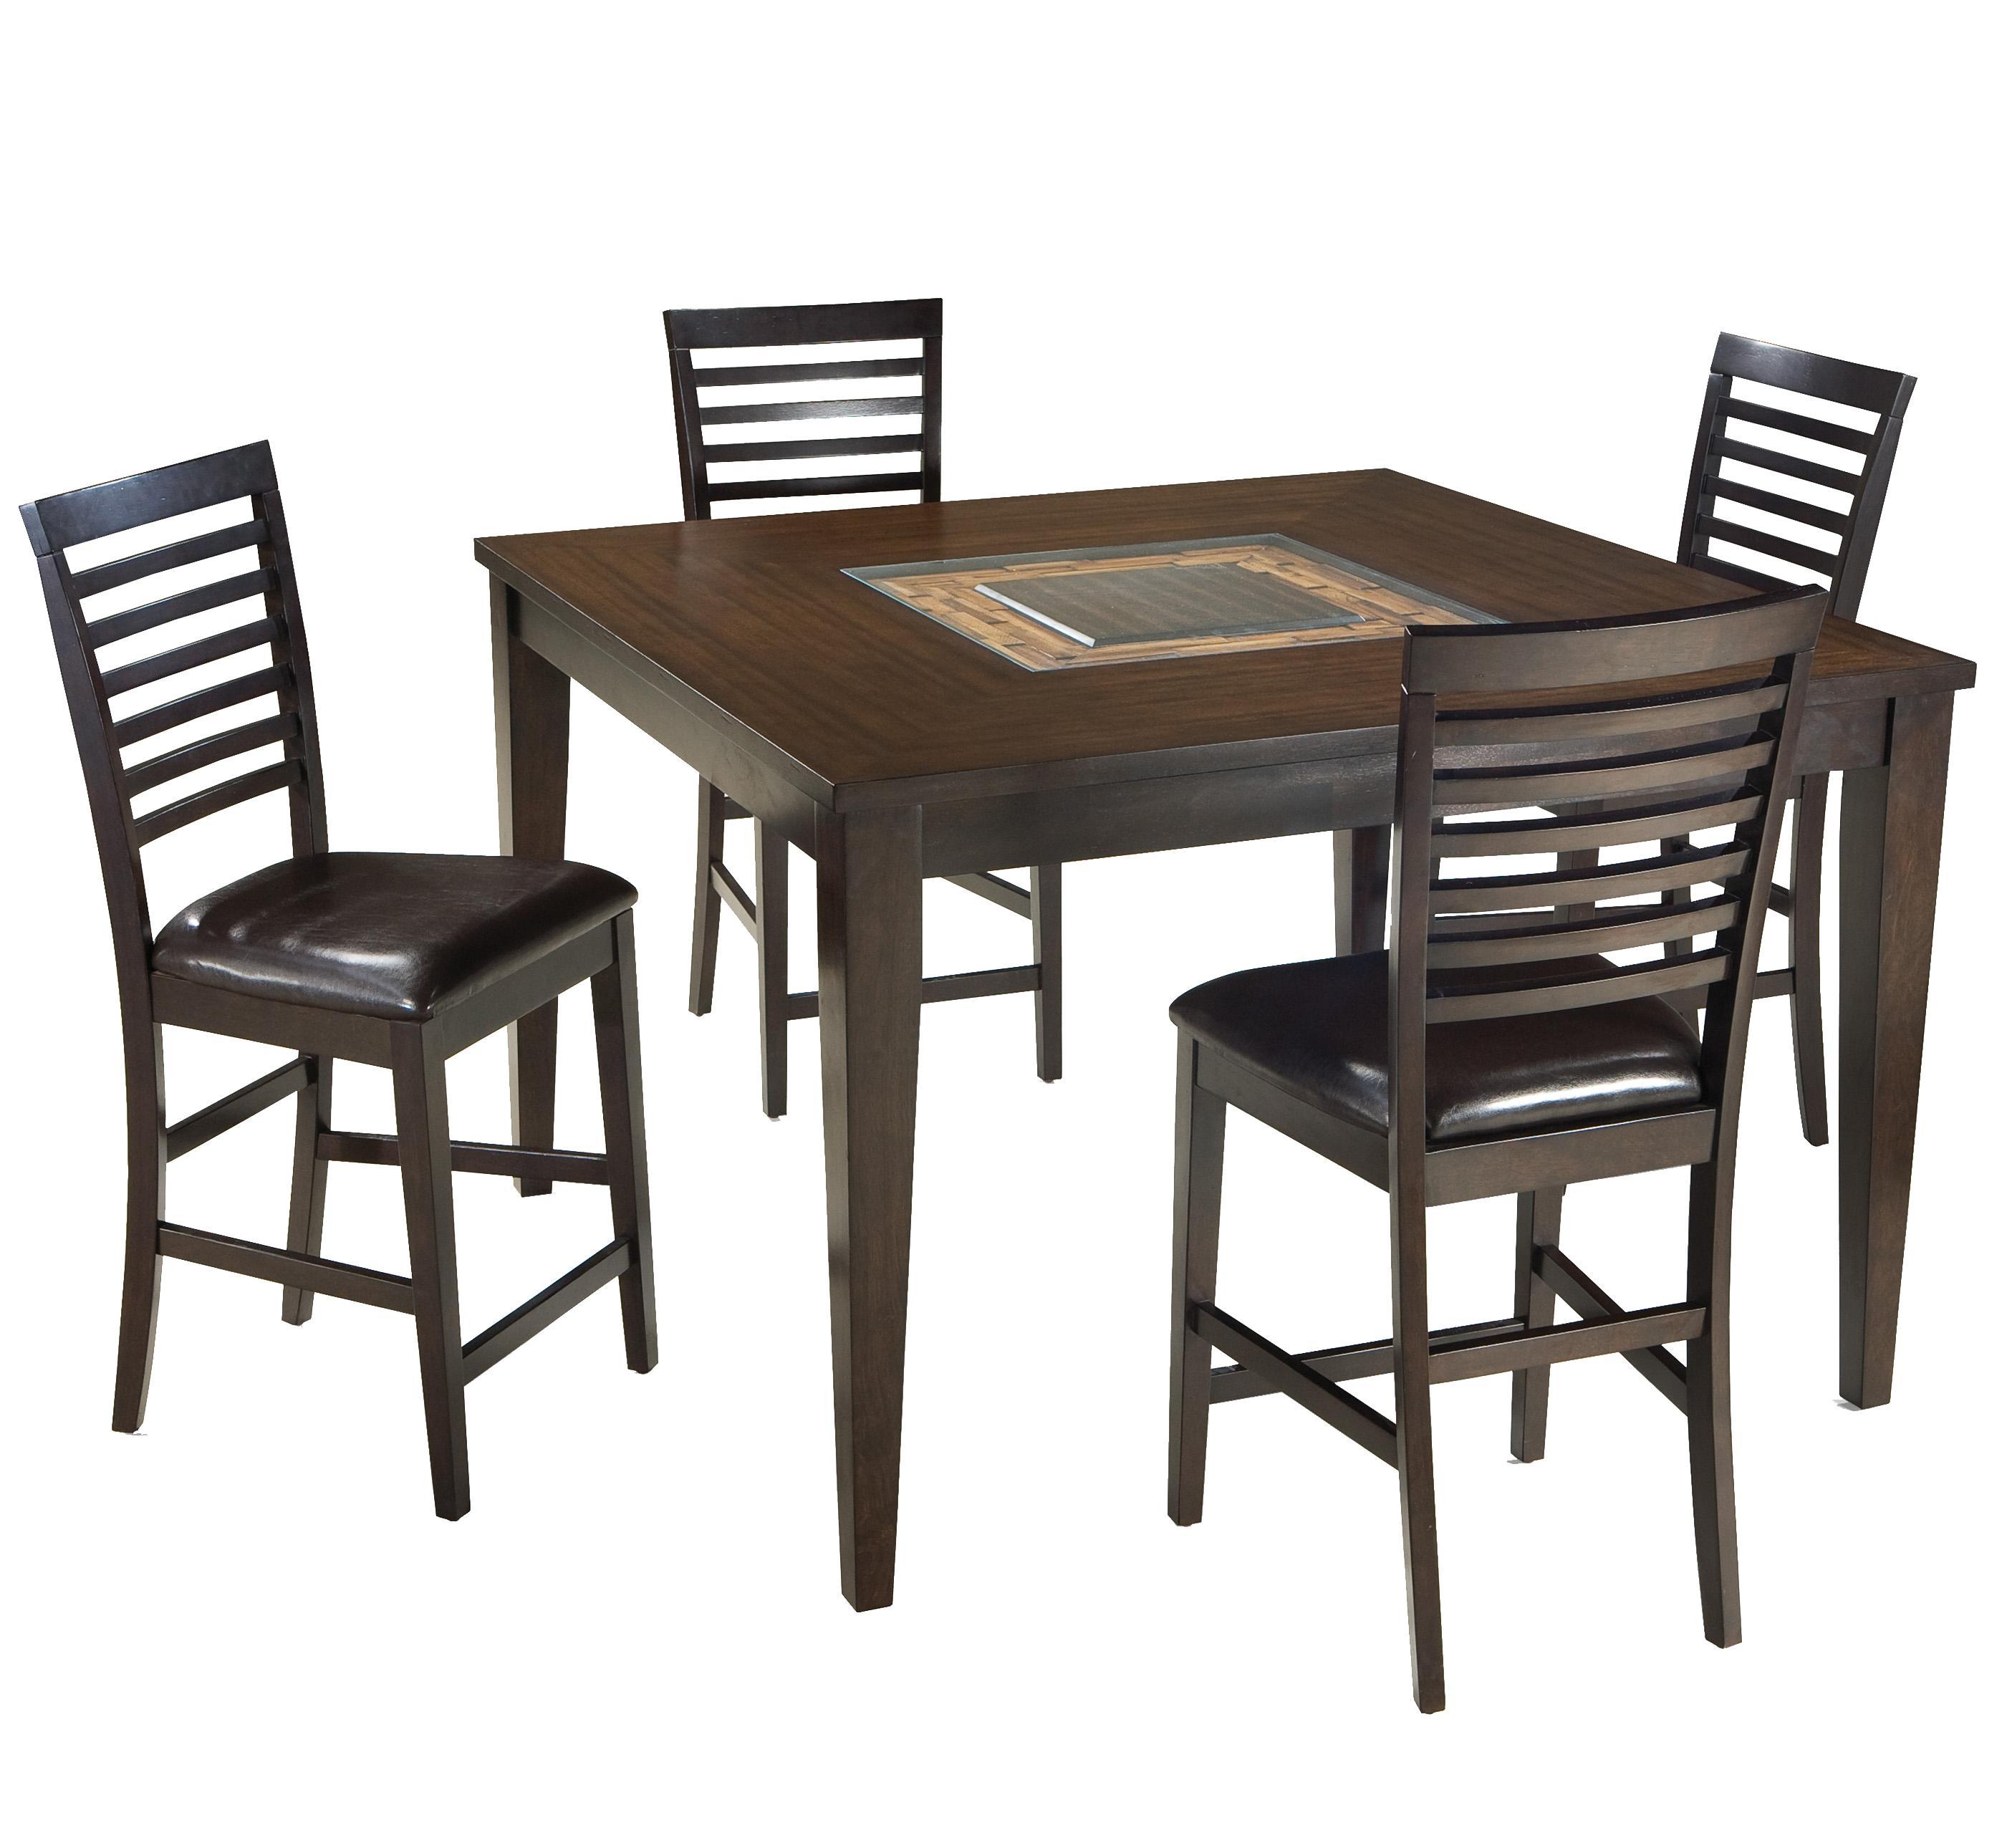 Intercon Kashi Gathering Table and Ladder Back Barstools - Item Number: KI-TA-5454G-CHA-C+4xBS-989C-CHA-K24